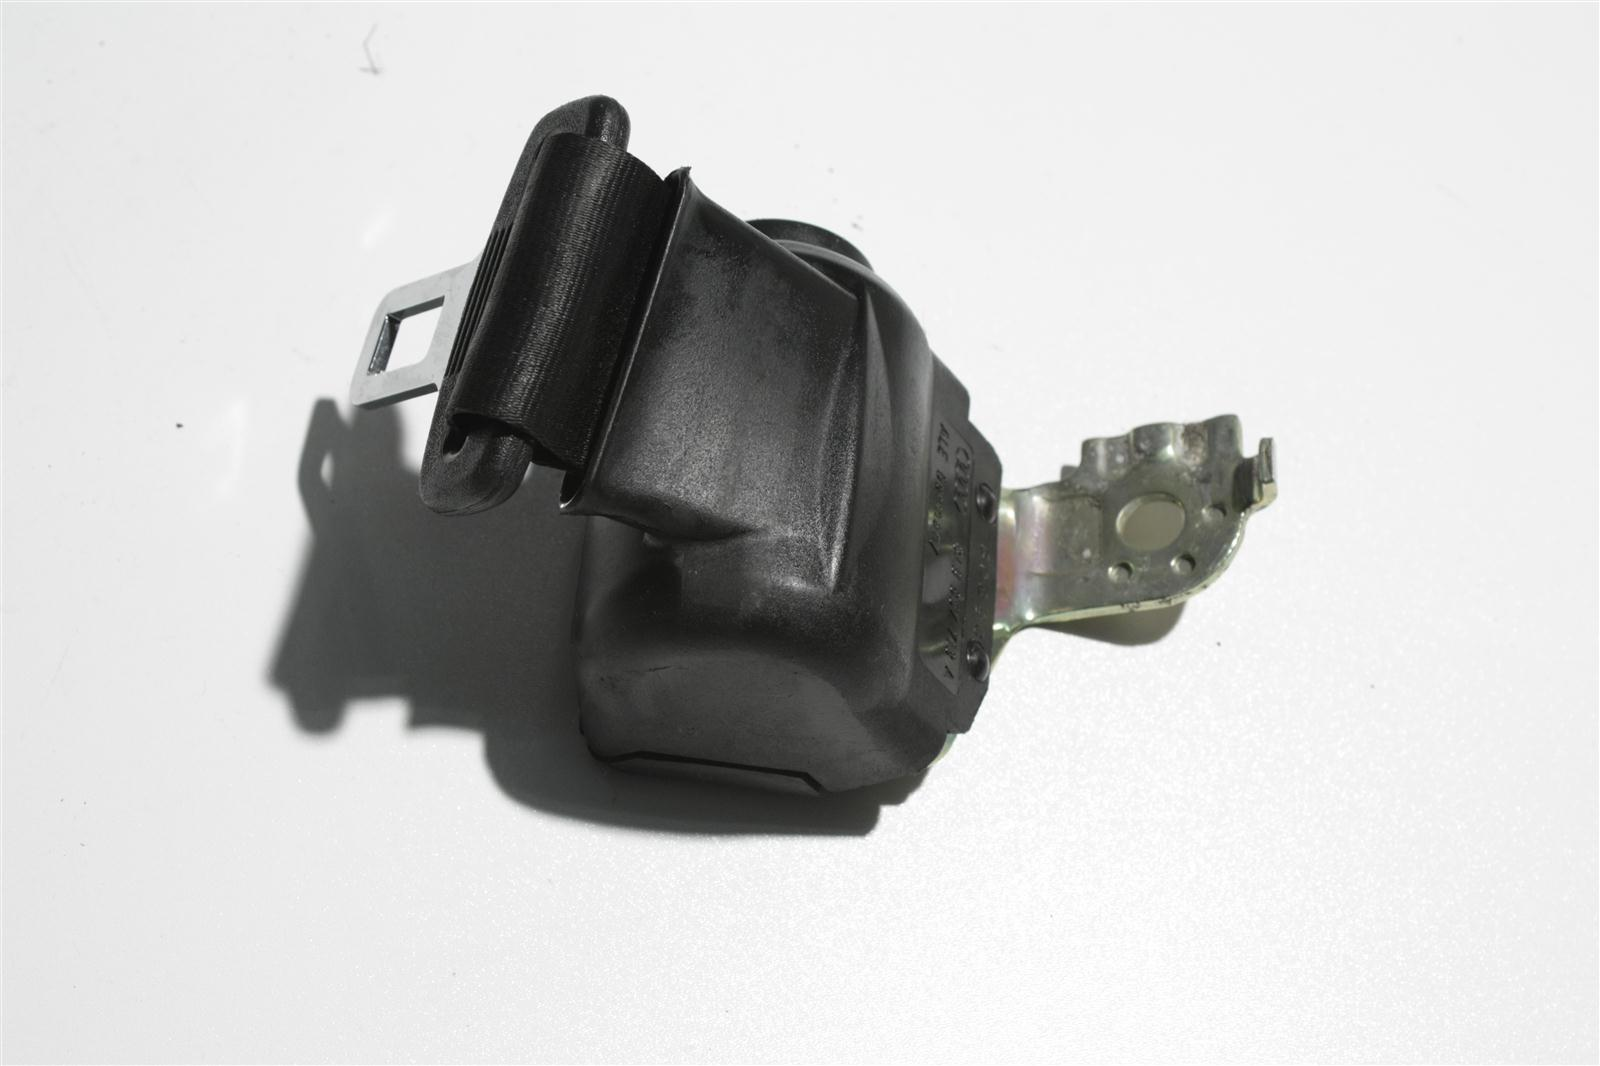 Audi 80 B4 Avant automatisch aufrollender Beckengurt Hinten Mitte schwarz 8A9857713A